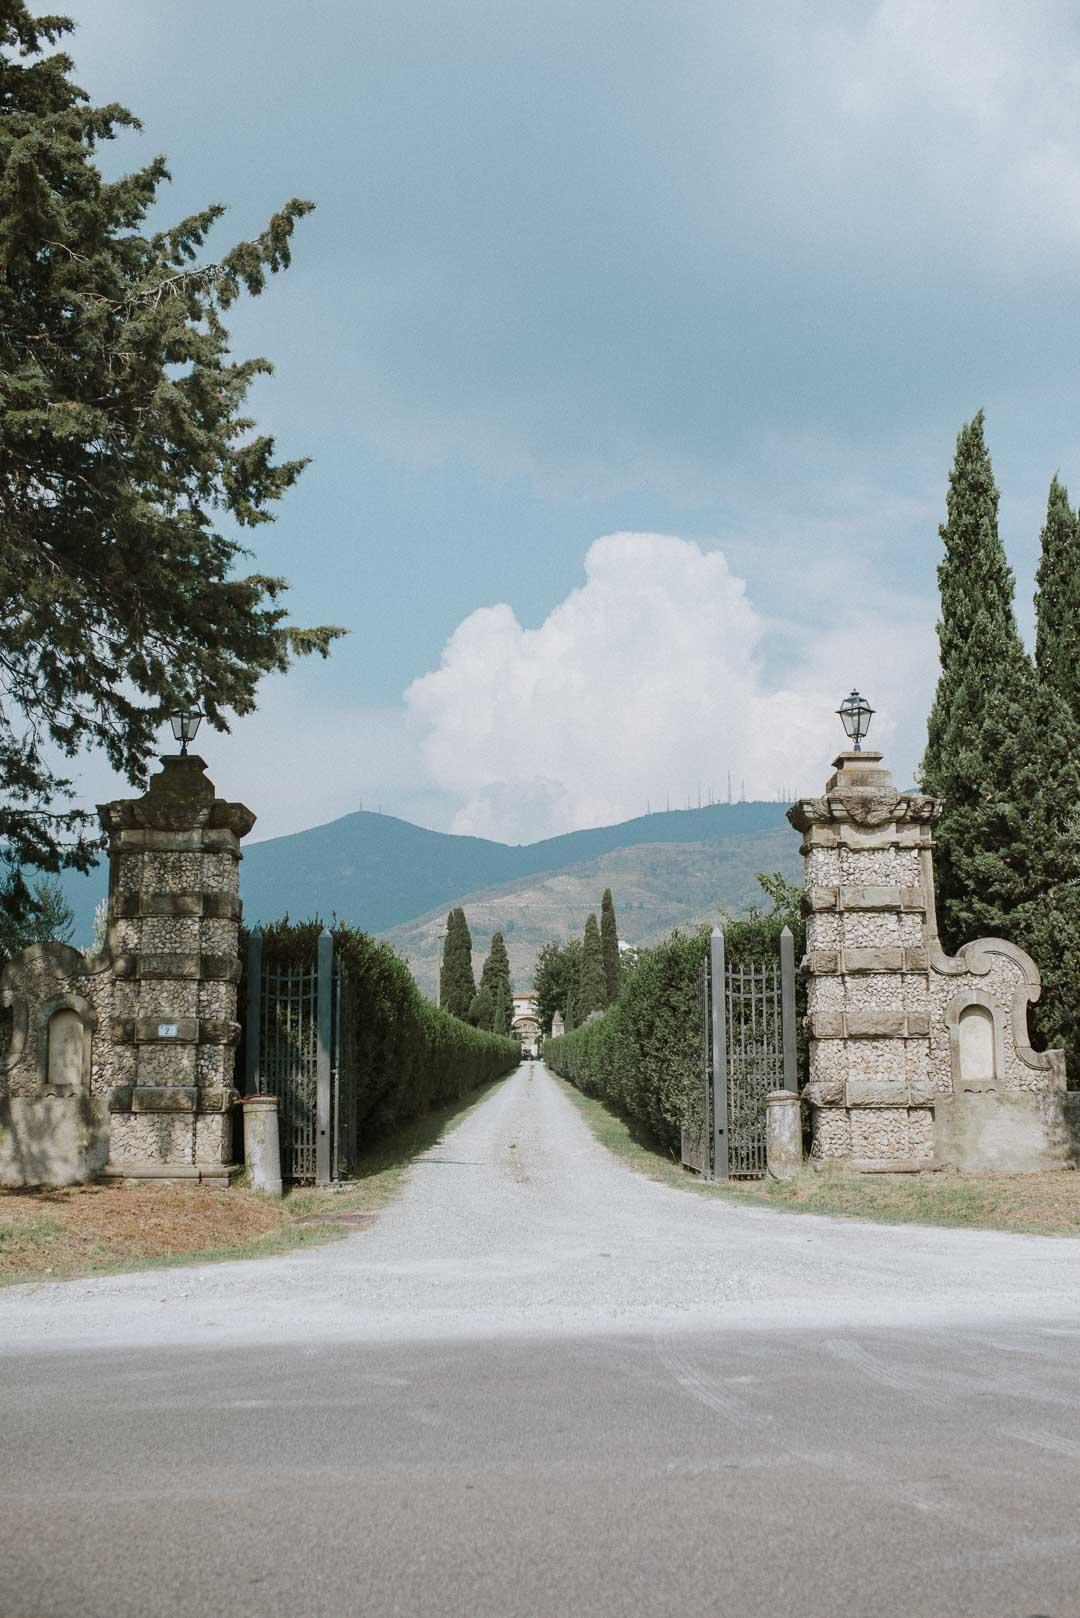 wedding-photographer-destination-fineart-bespoke-reportage-tuscany-villascorzi-vivianeizzo-spazio46-20